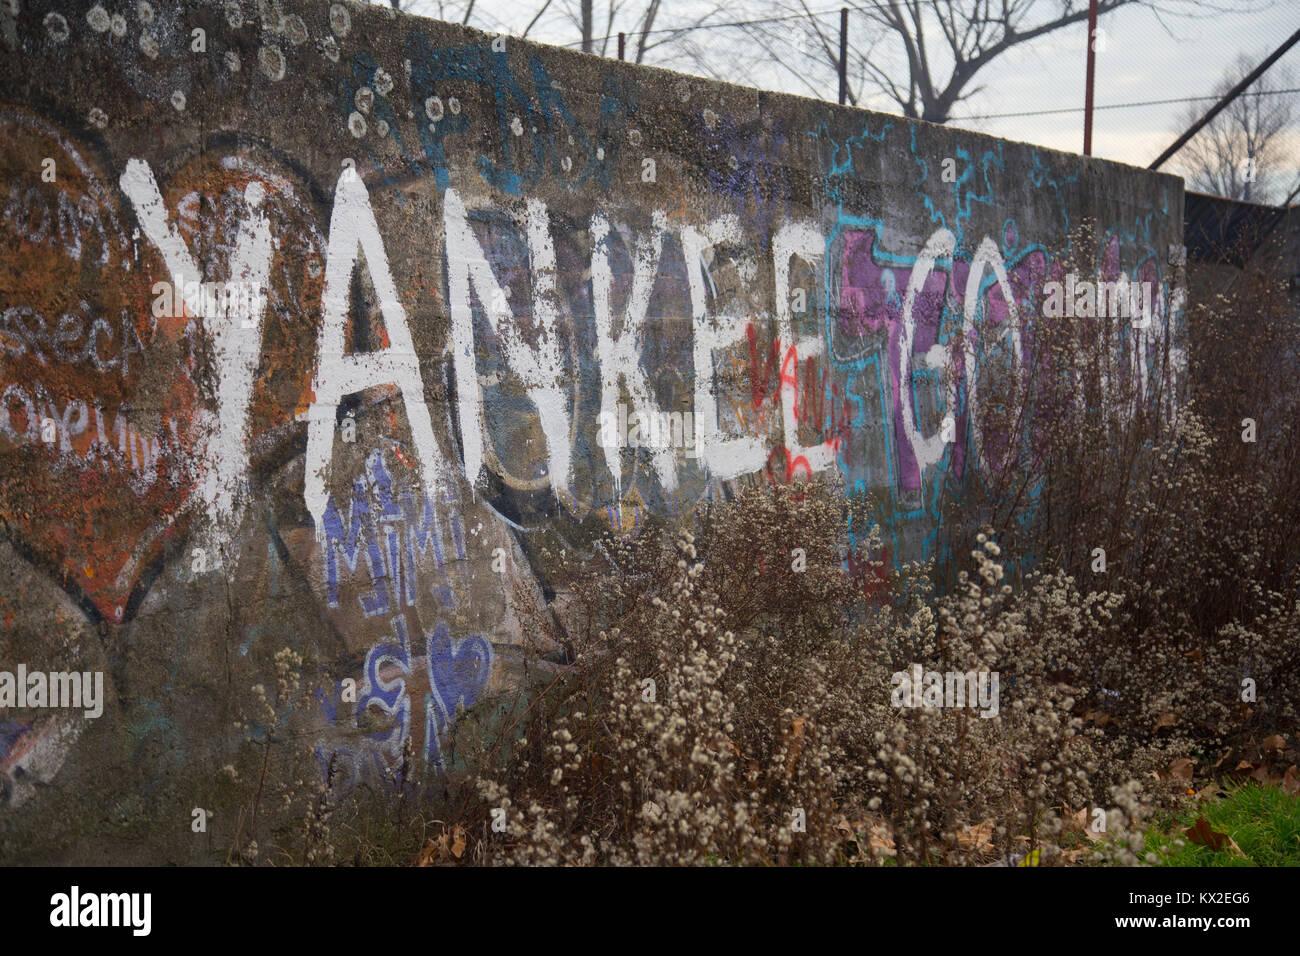 Anti-America inscription Yankee go home mural graffiti on a wall in Zemun, Belgrade, Serbia - Stock Image